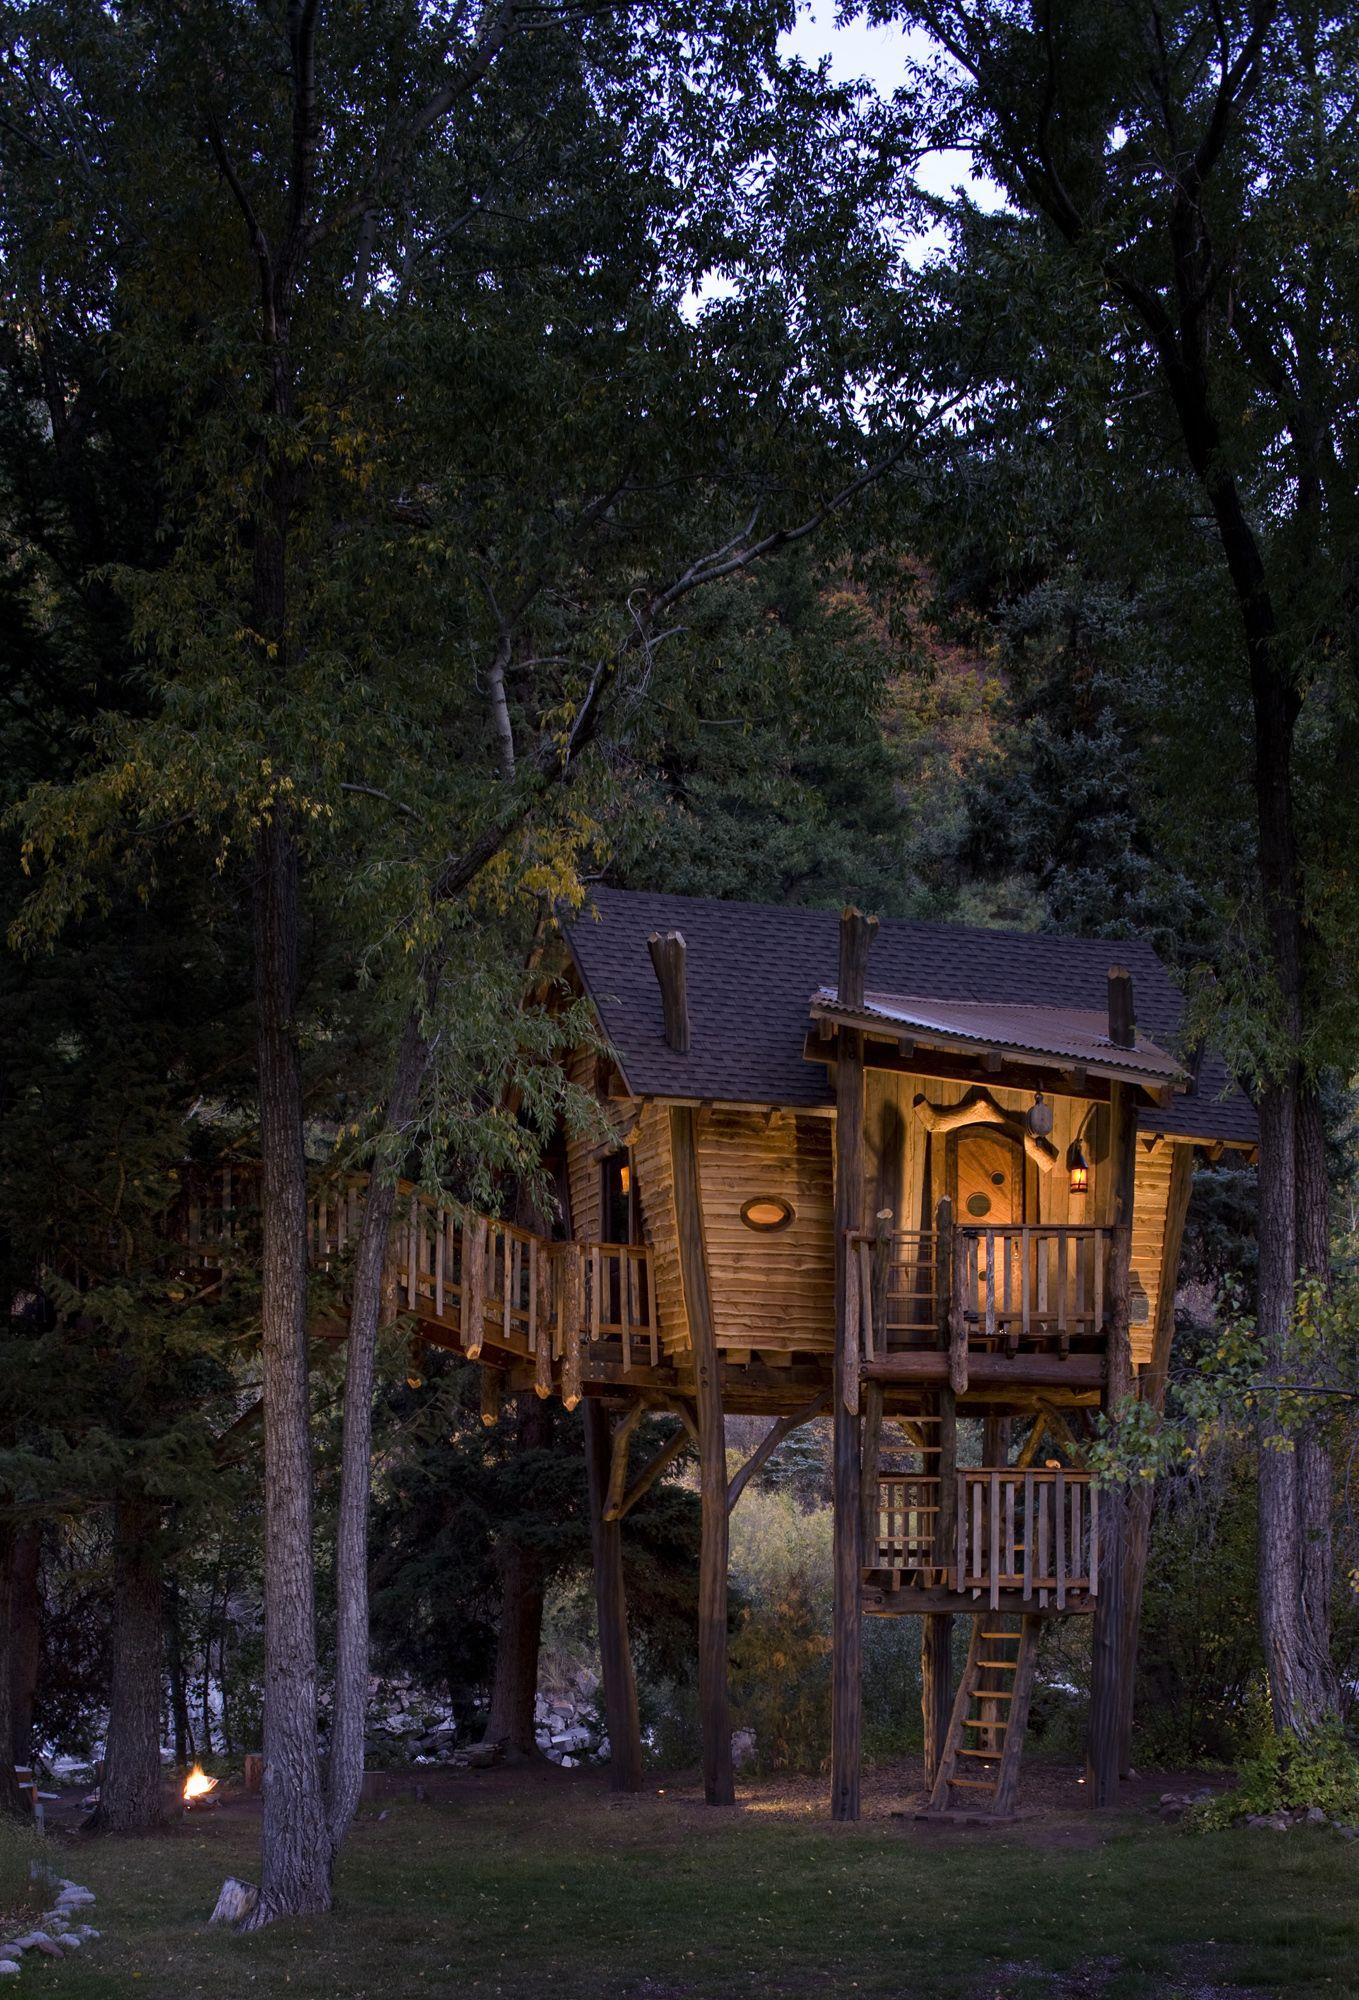 David Rasmussen Colorado - modern furniture and tree houses ...